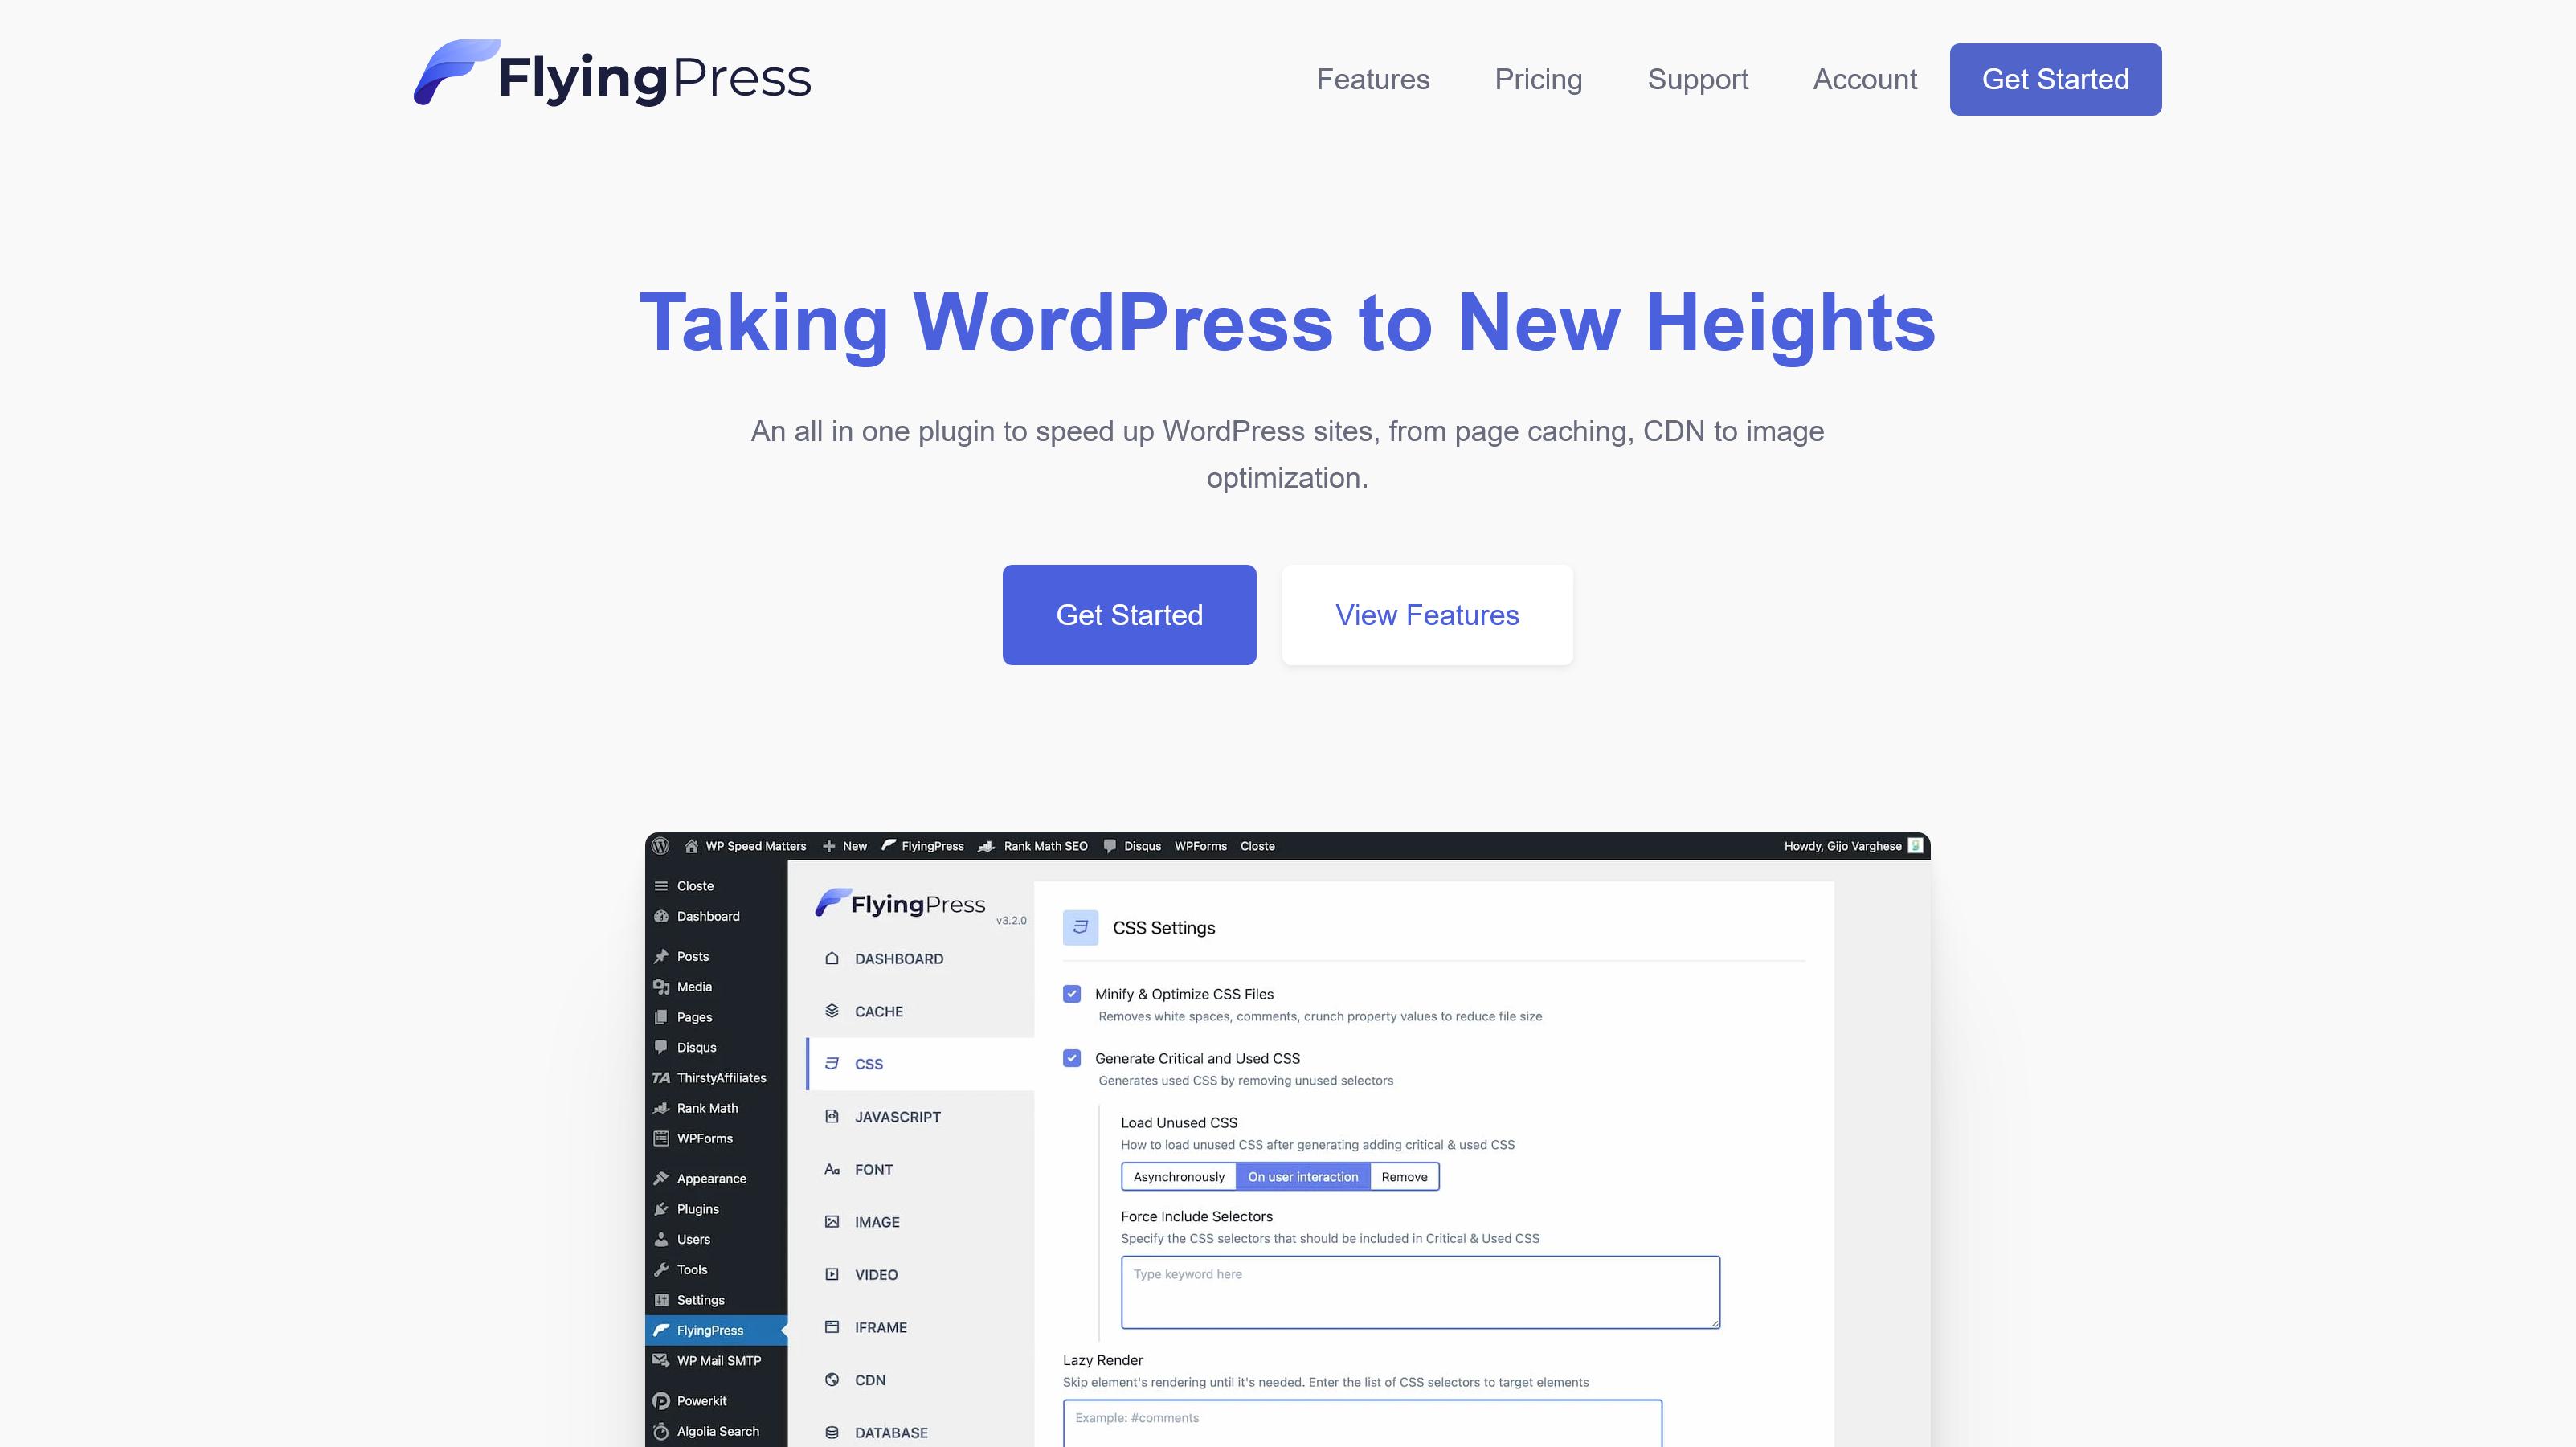 FlyingPress Pro WordPress Plugin 3.6.0